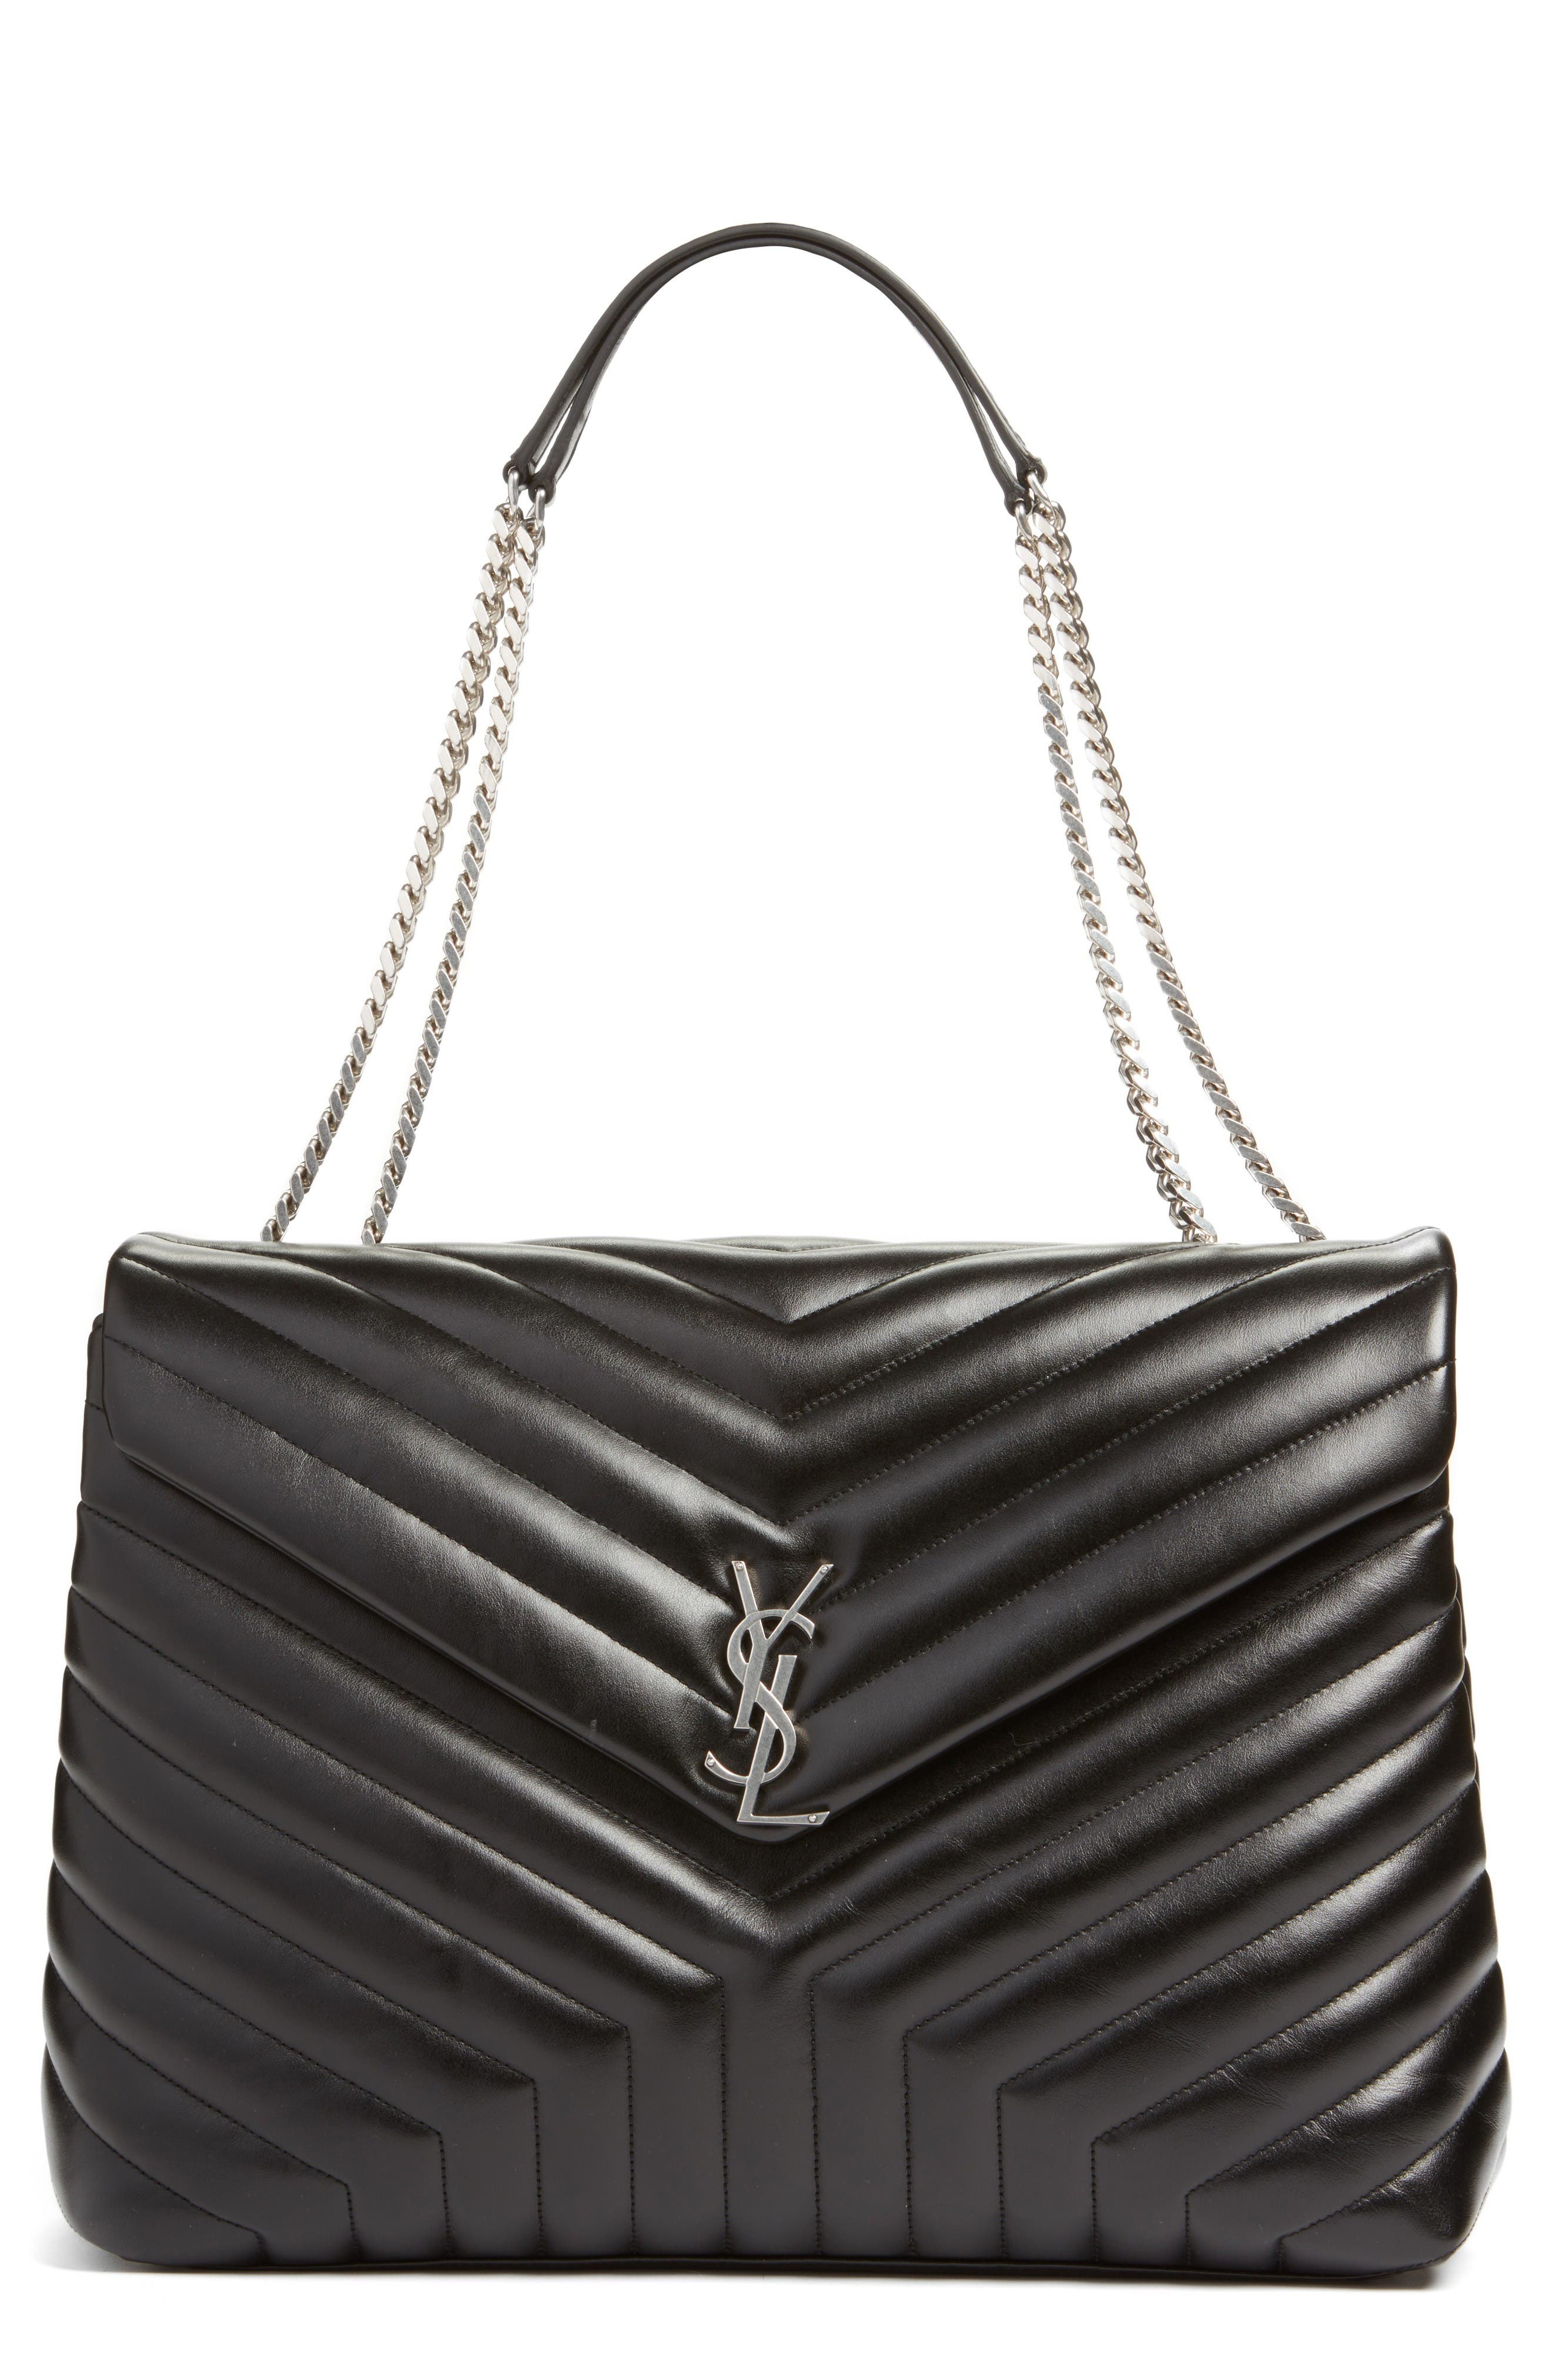 Main Image - Saint Laurent Monogram Quilted Leather Slouchy Shoulder Bag